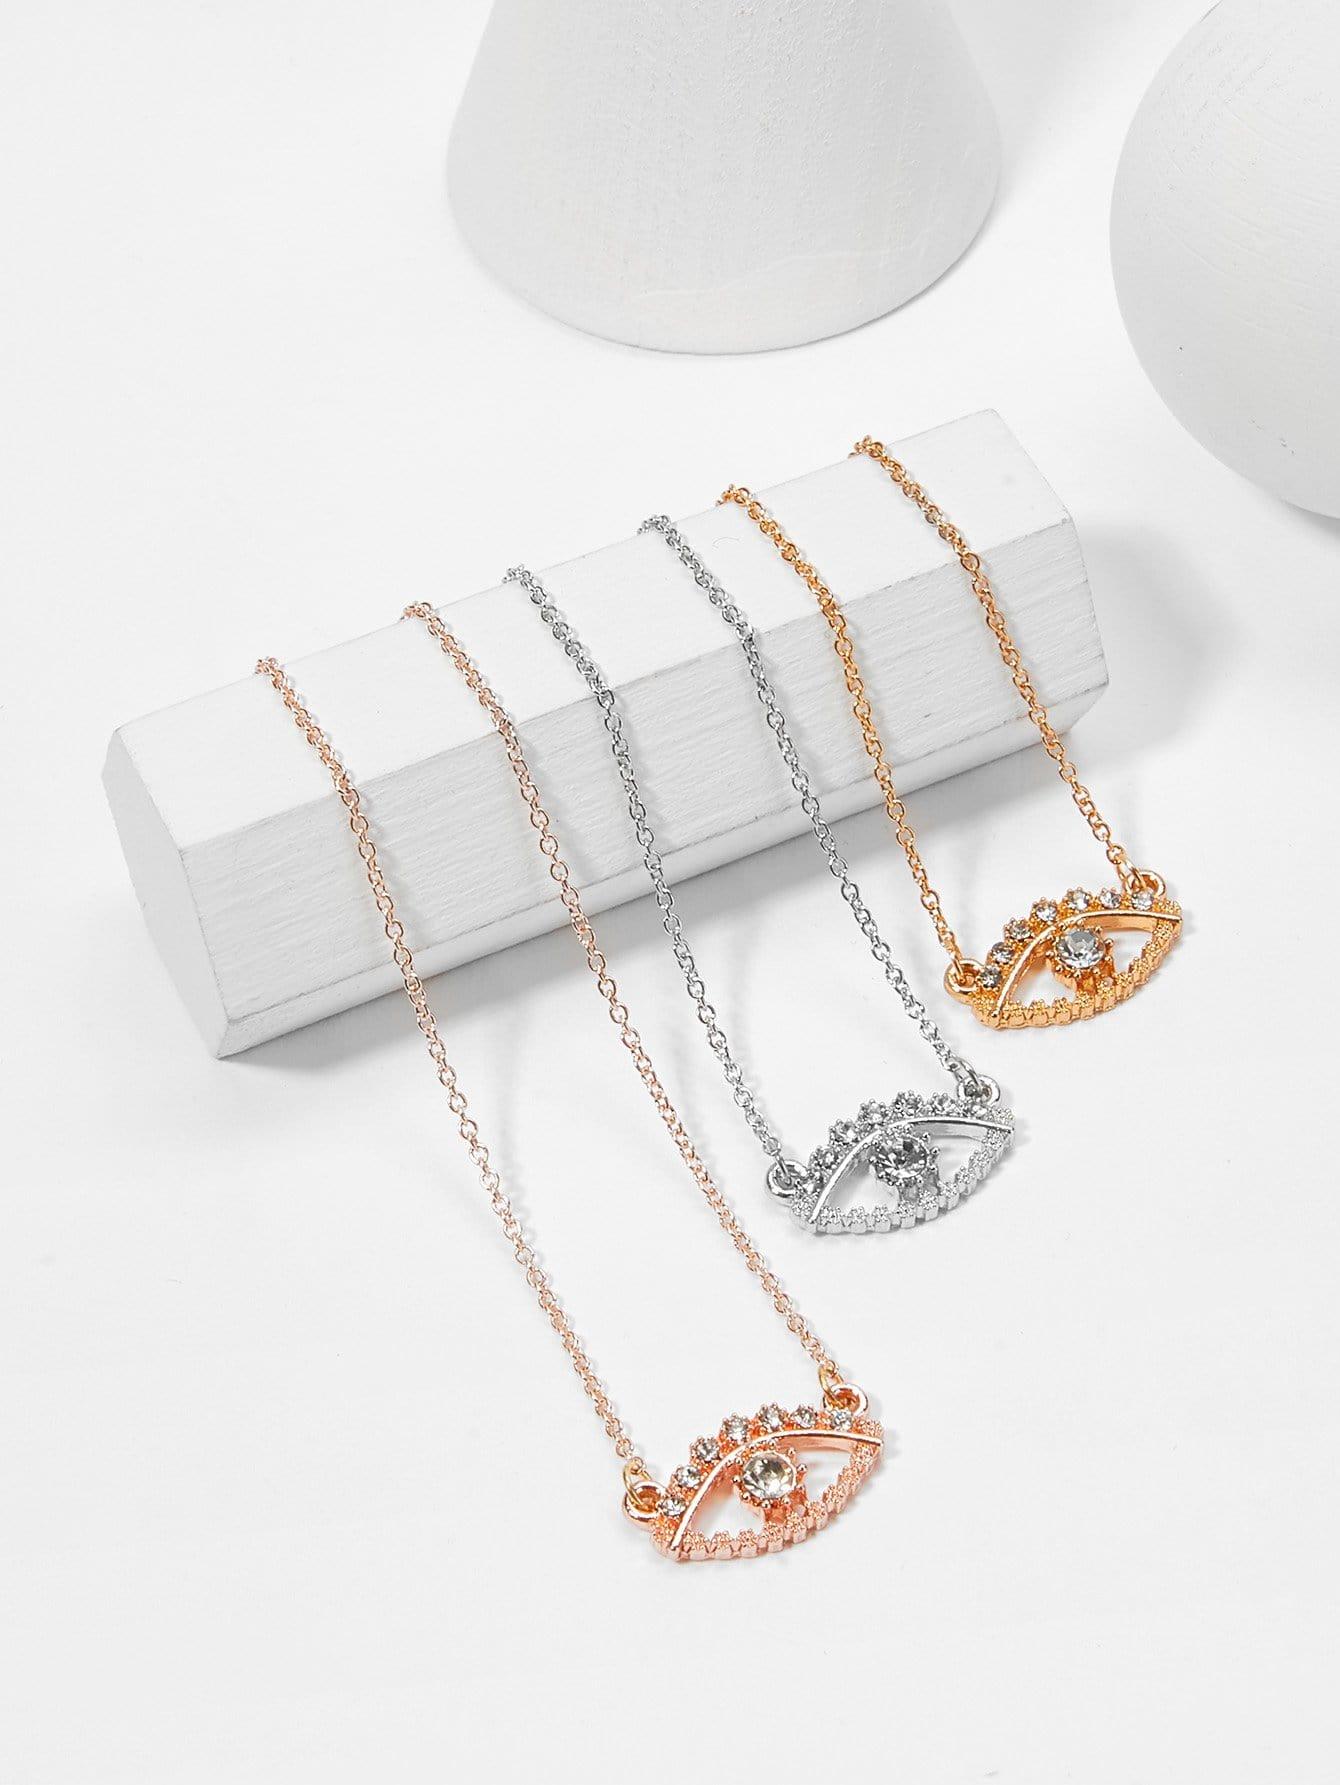 Rhinestone Eye Pendant Chain Necklace Set 3pcs hollow heart pendant necklace set 3pcs